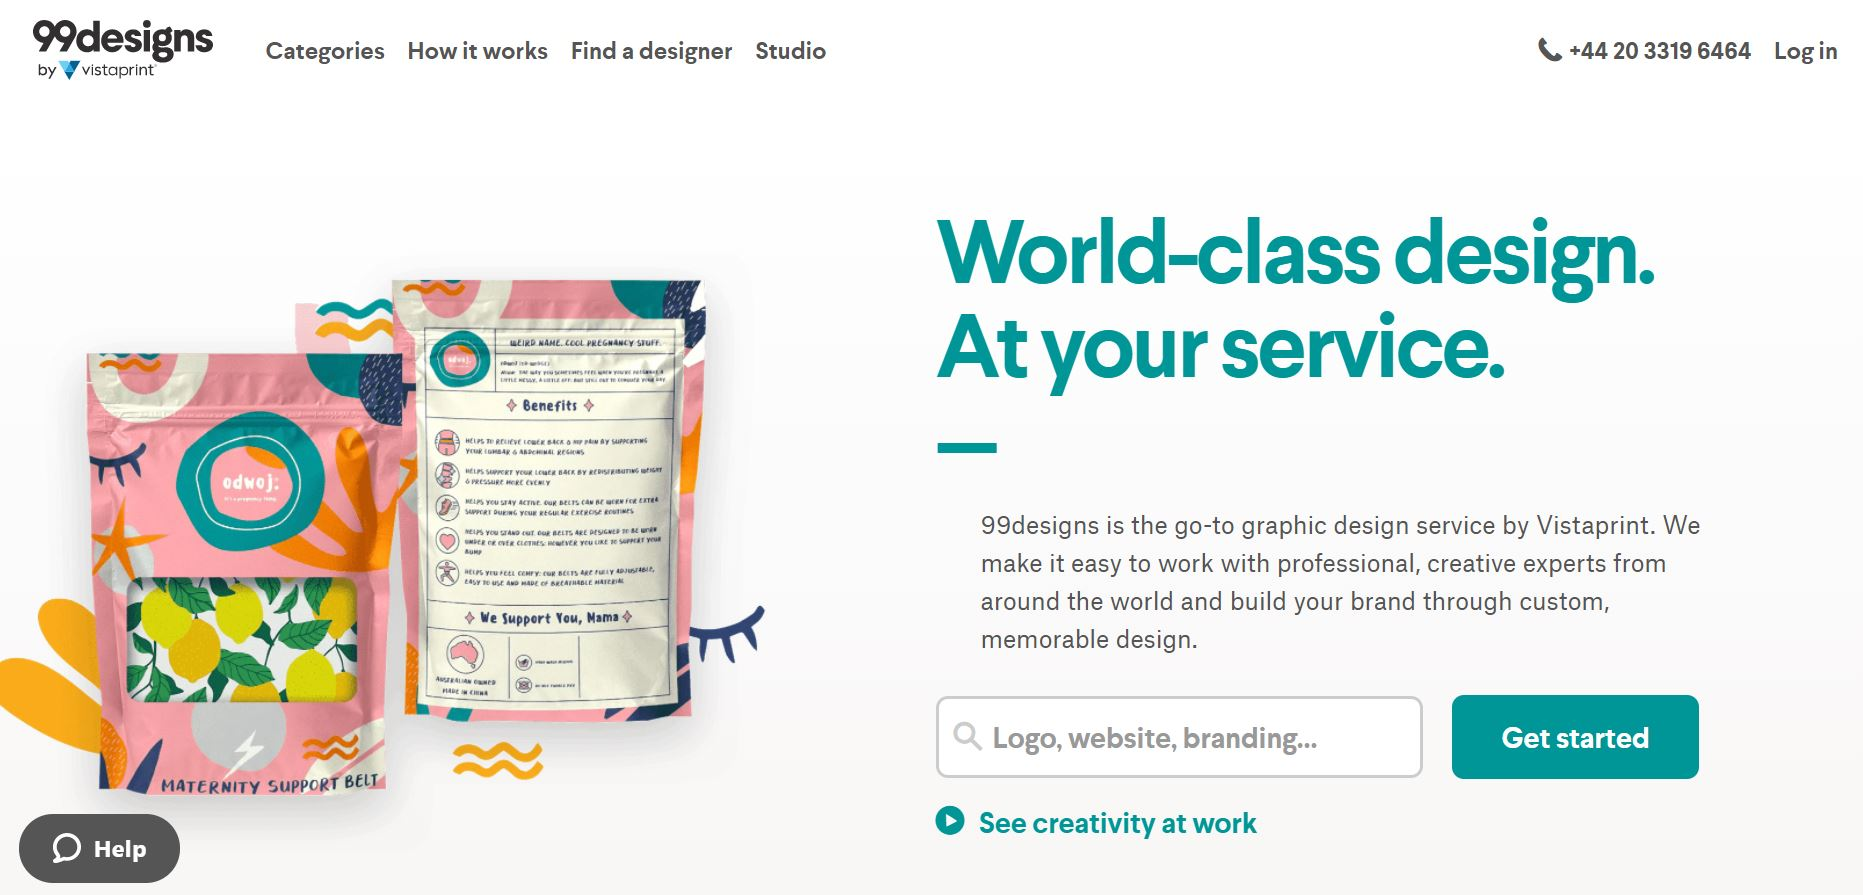 99designs webpage screenshot